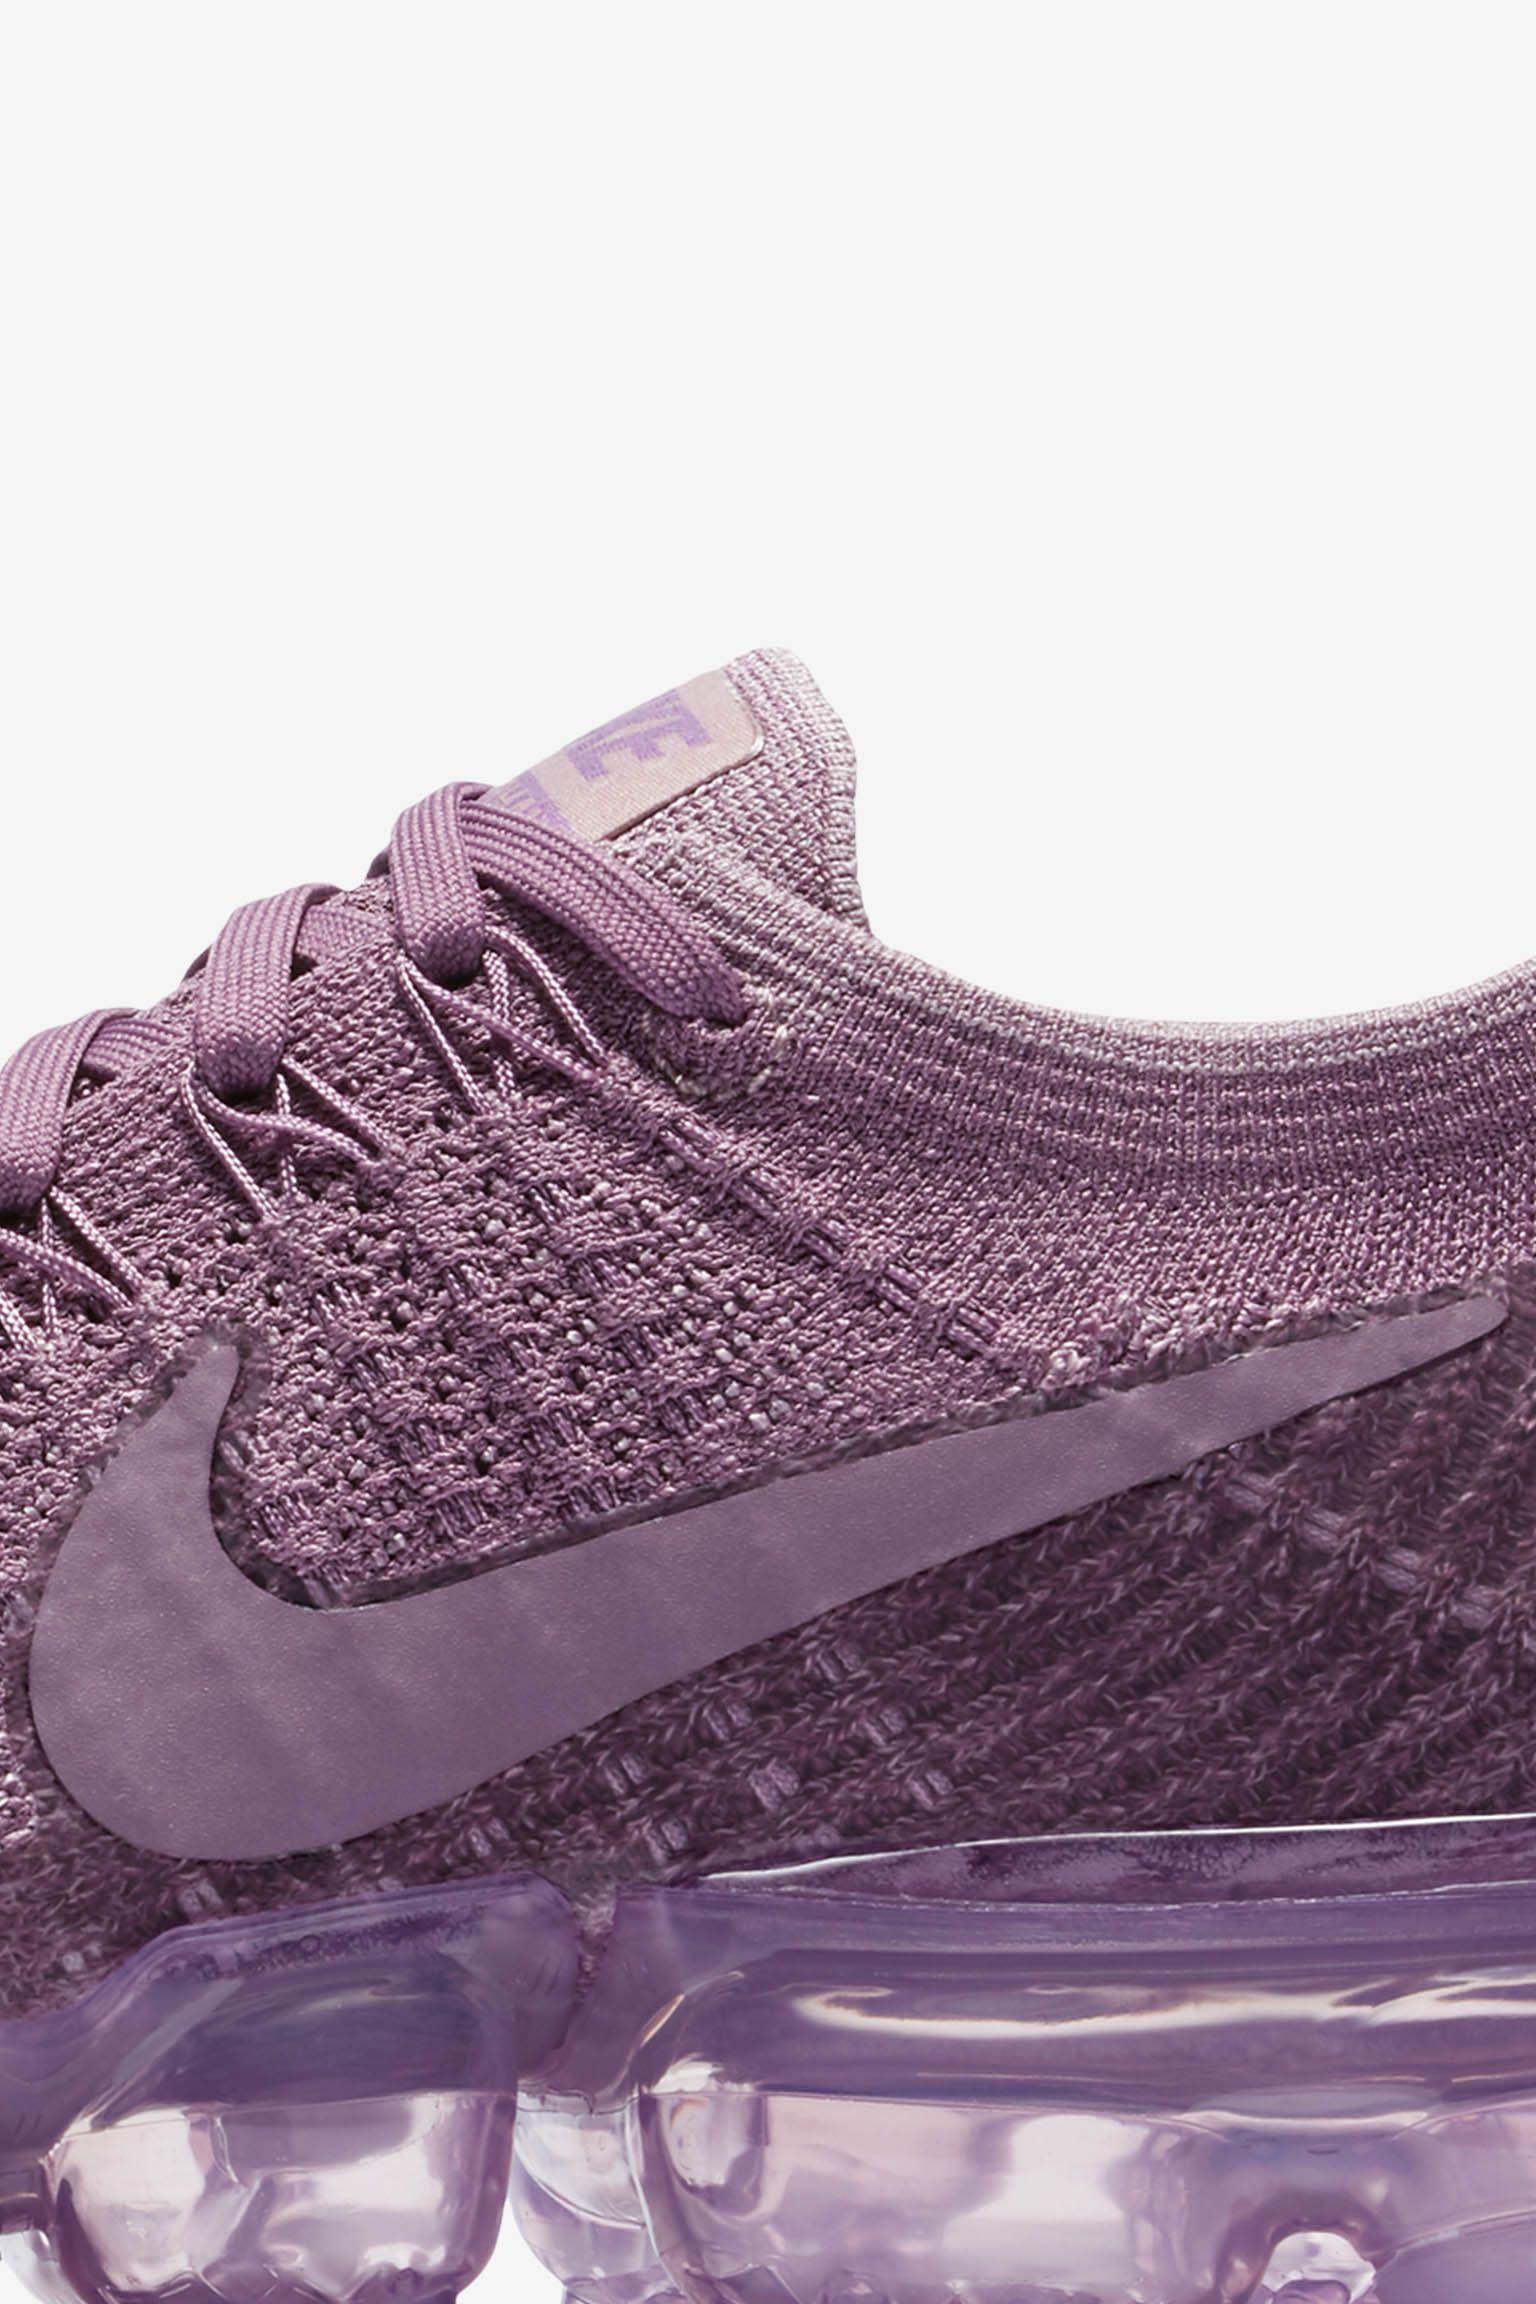 timeless design 38933 5ac26 wholesale purple womens nike vapormax 33bdd a410c